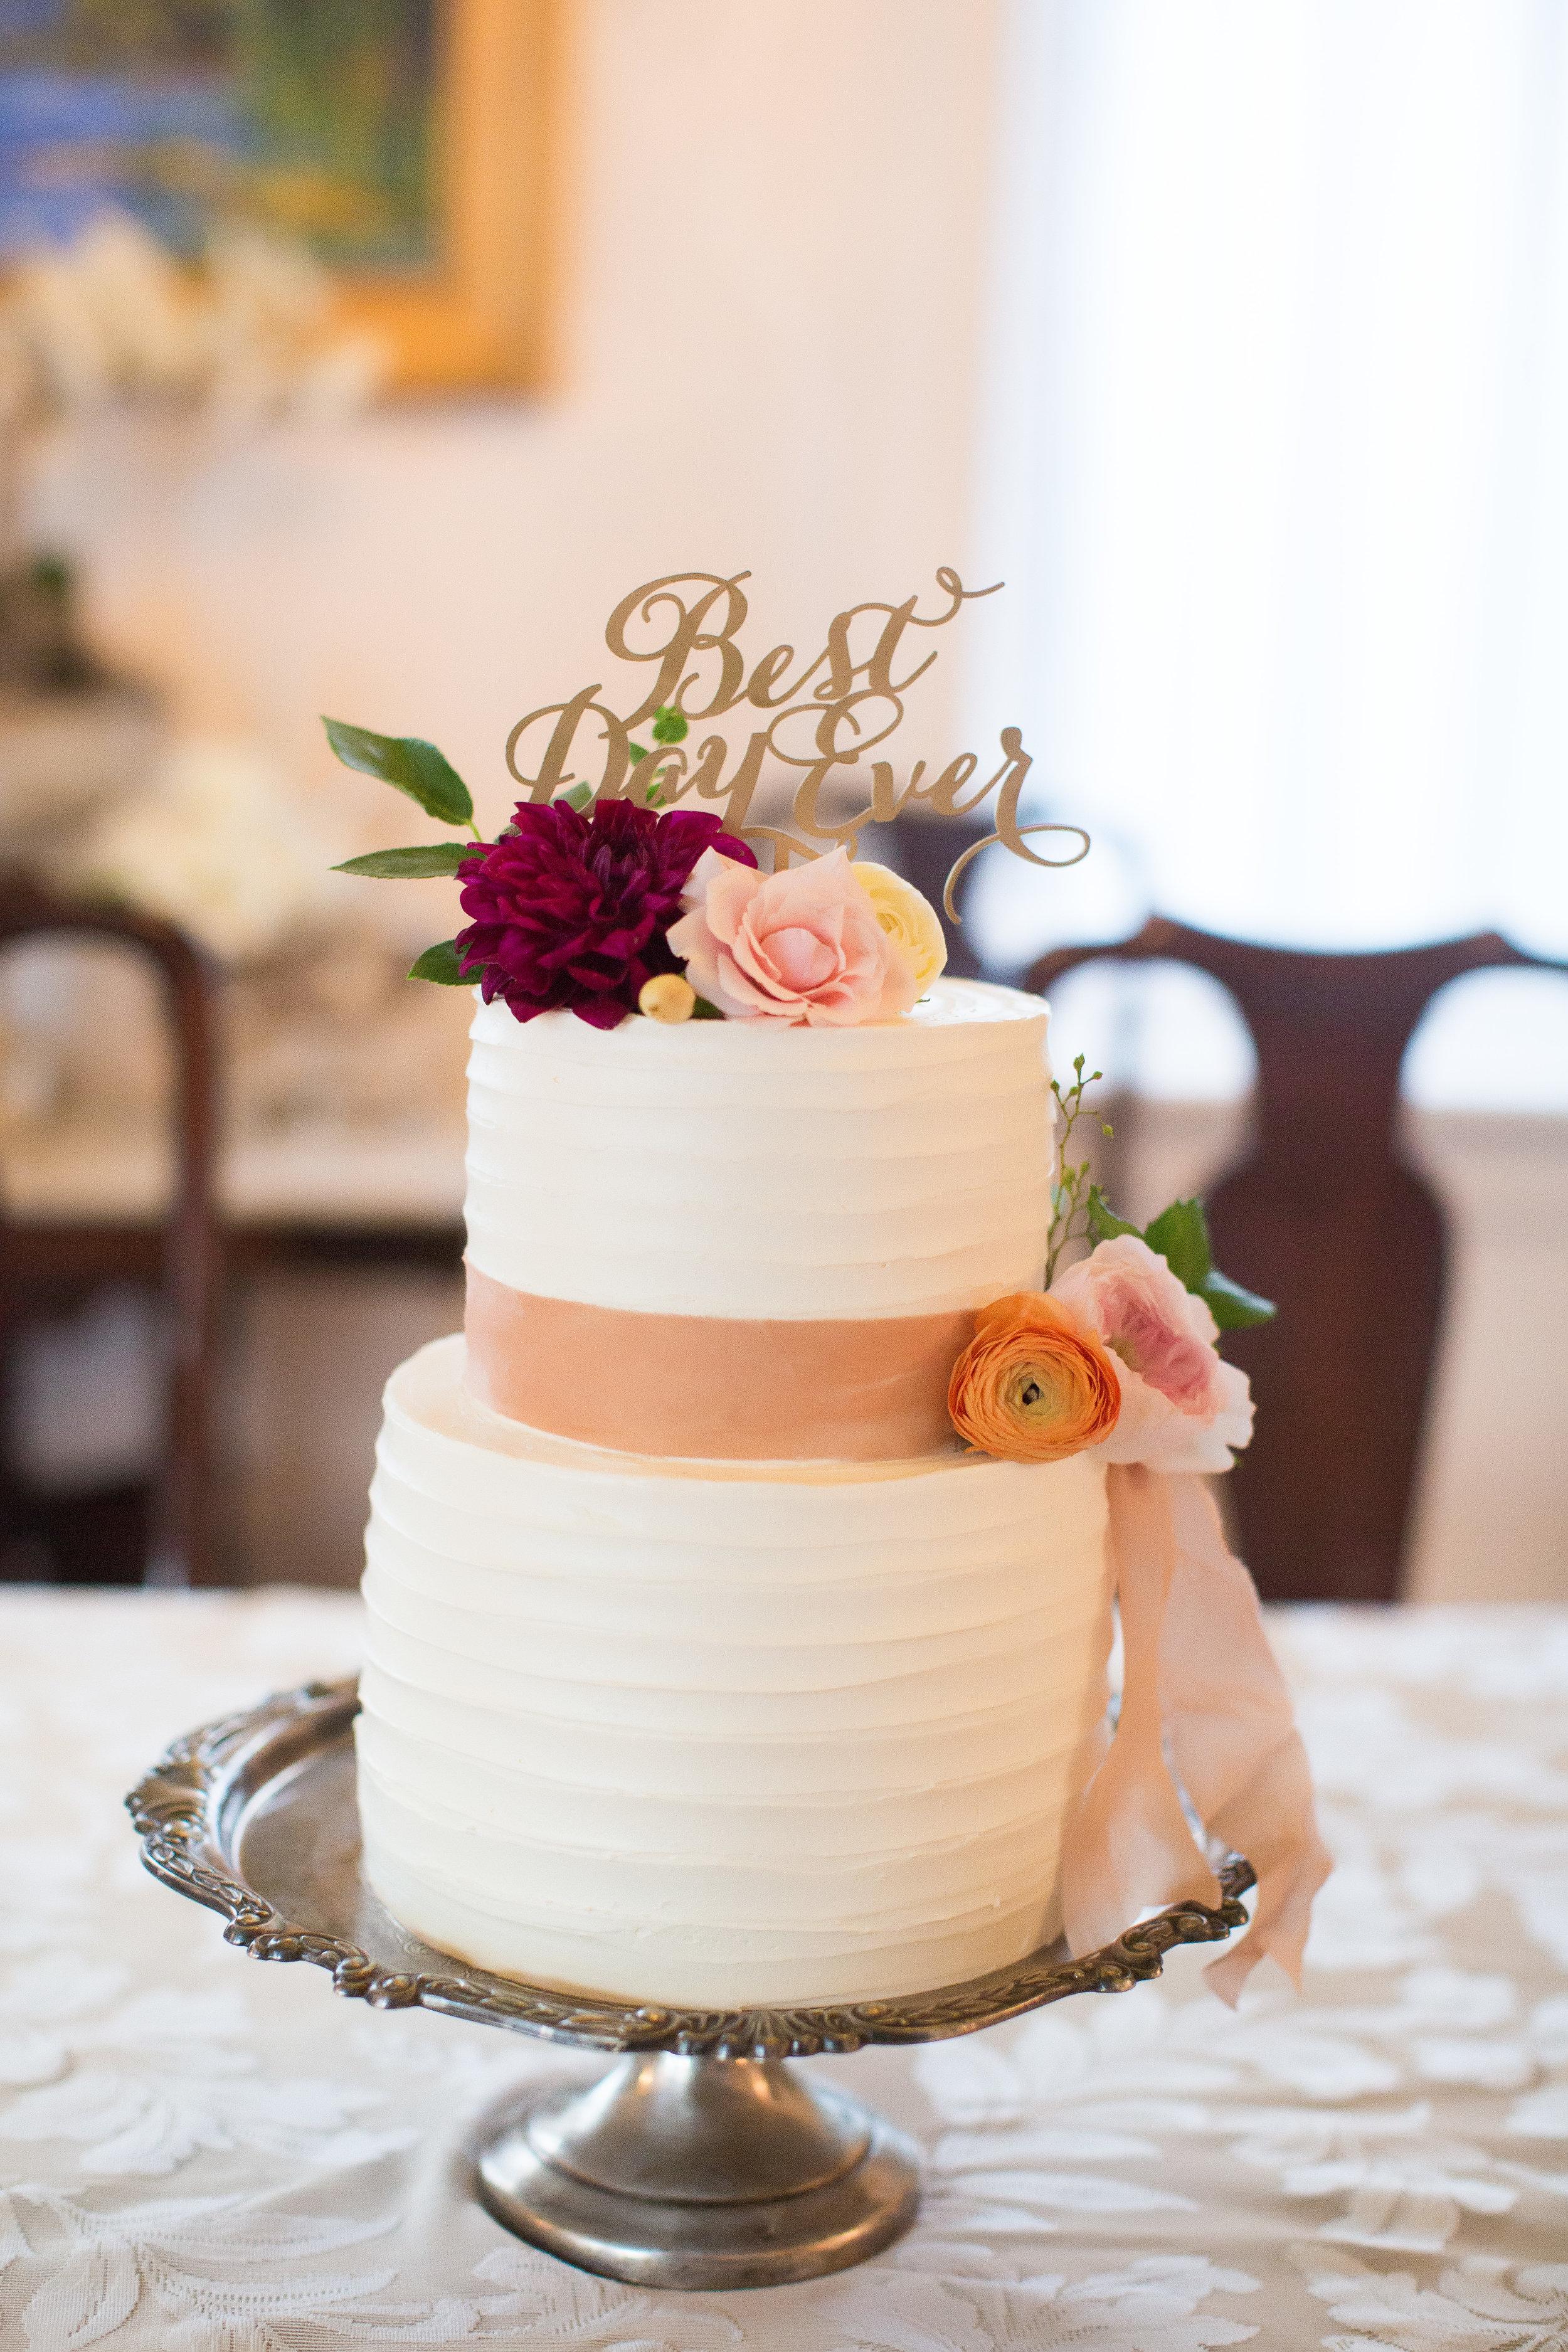 Charleston, Greenville, Atlanta, Destination Elopement Pop-Up Wedding Planners Scarlet Plan & Design (40).jpg